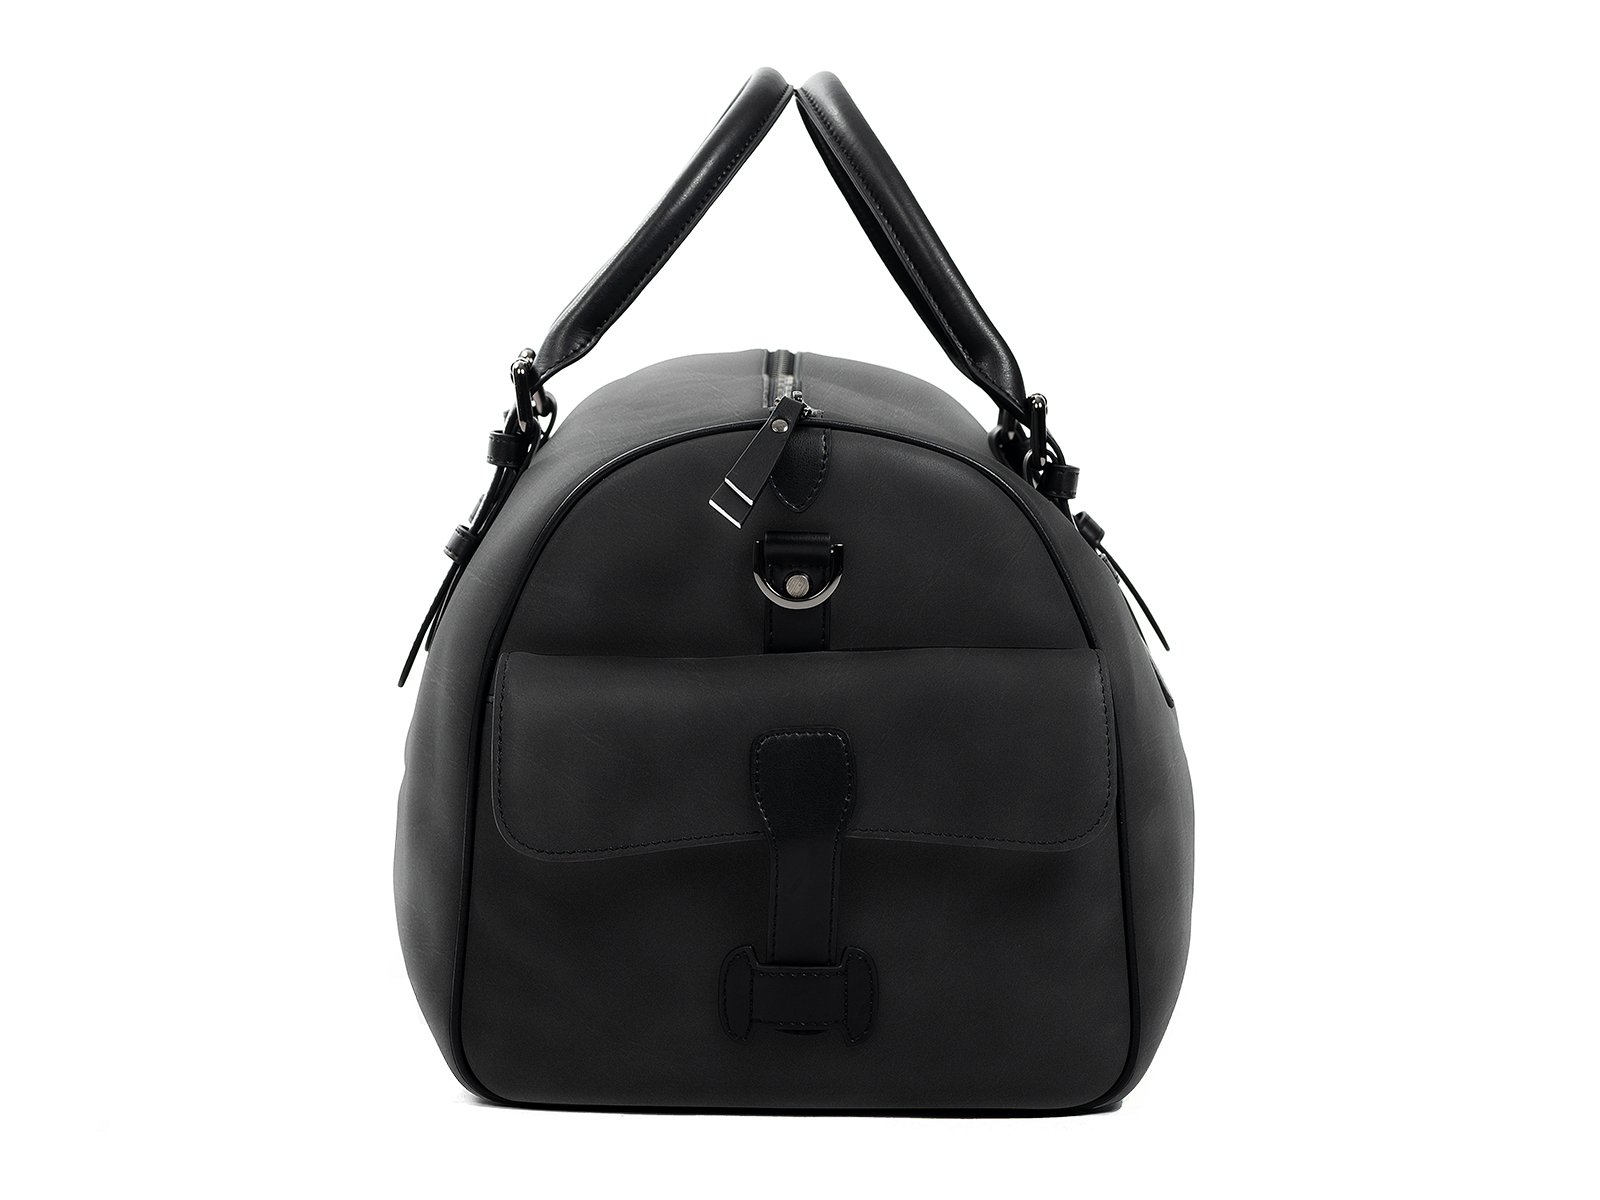 kingsman leather duffle bag